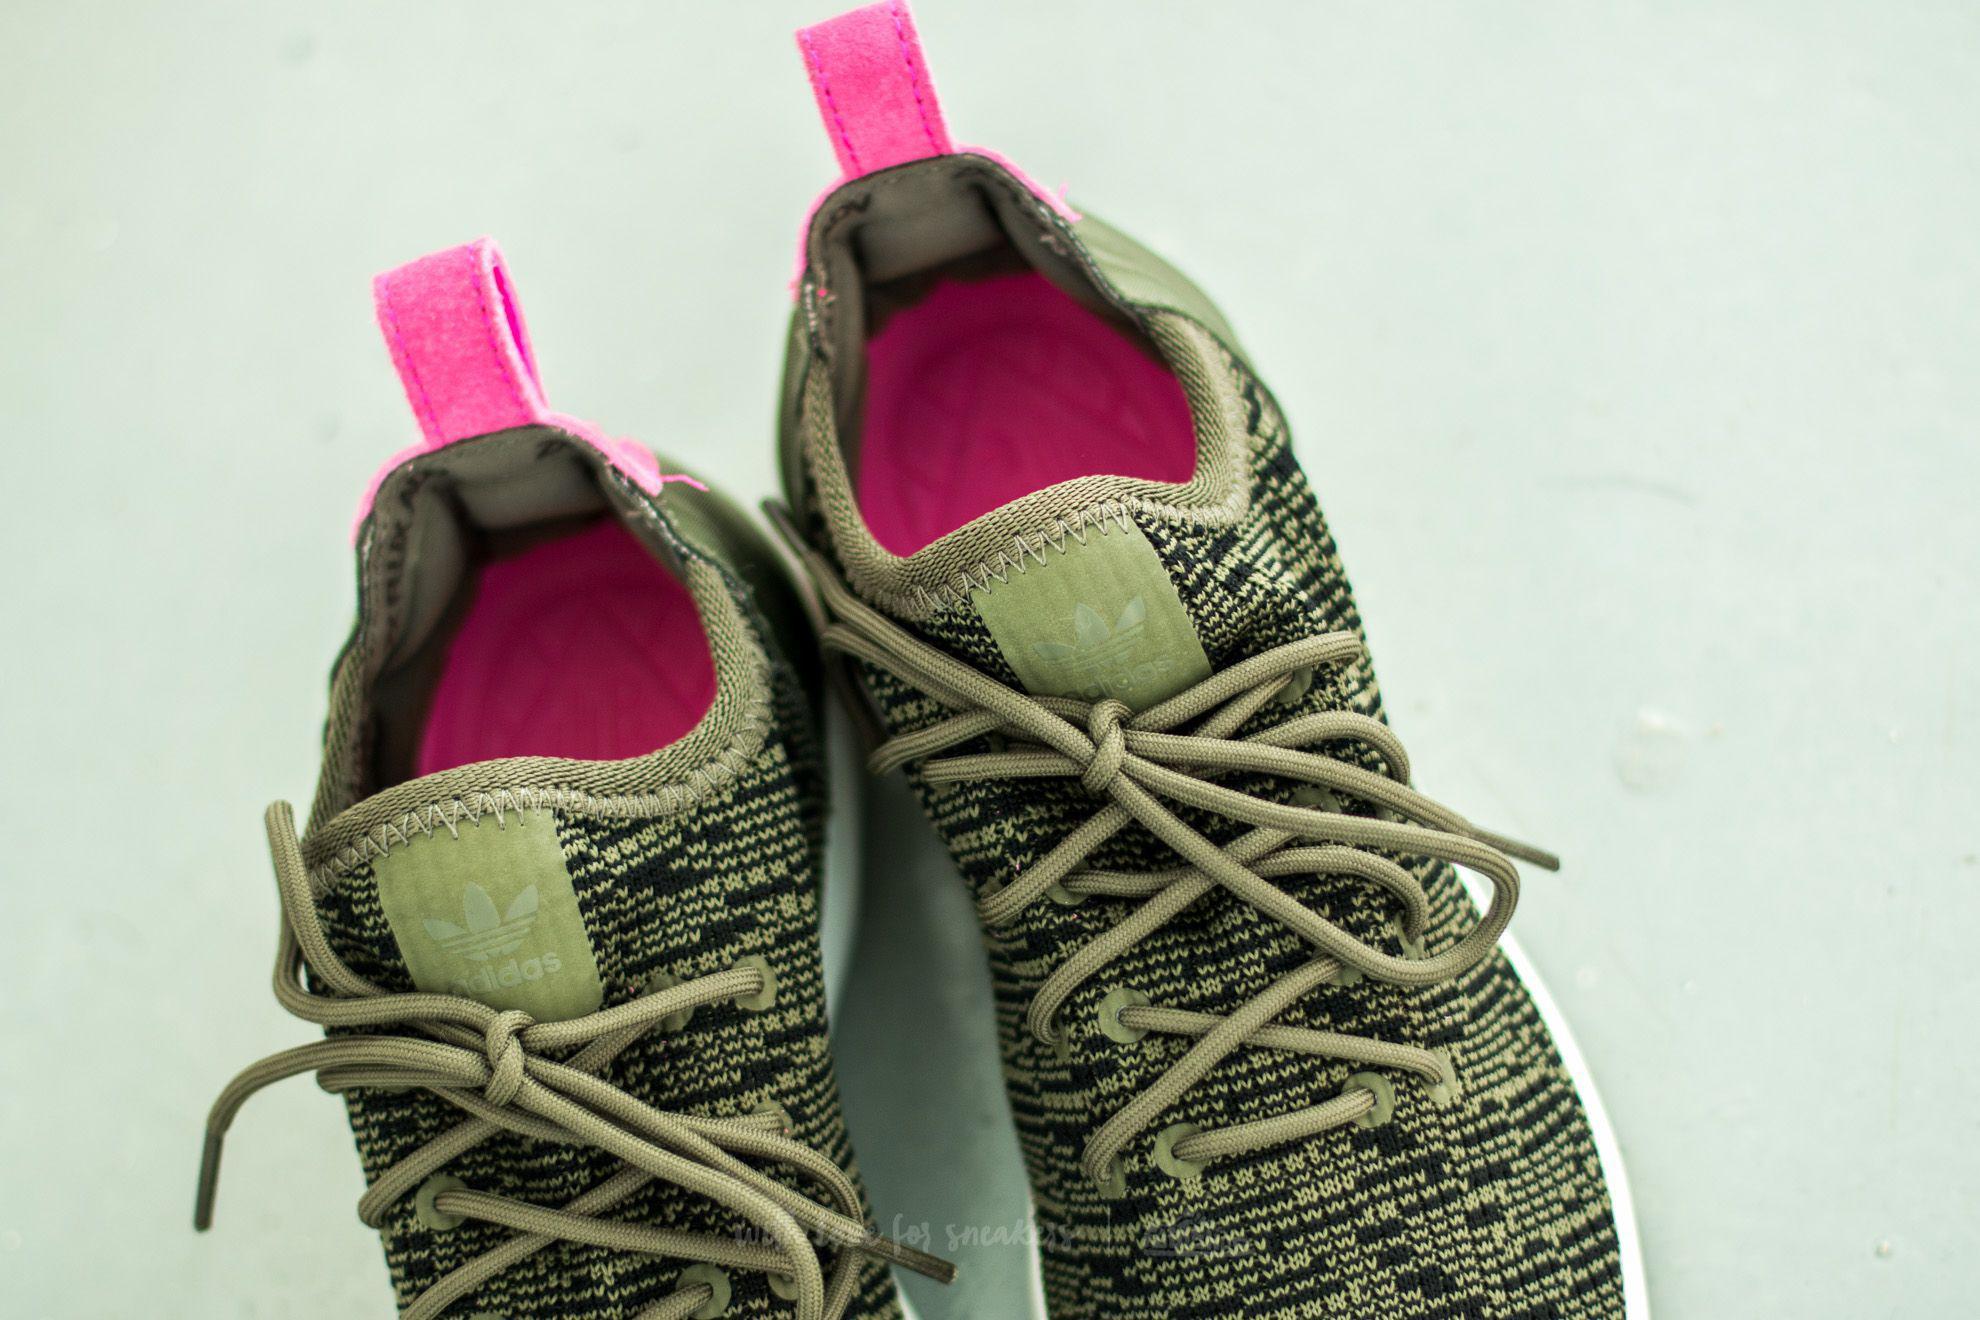 e9d49ad981d4b Lyst - adidas Originals Adidas Zx Flux Adv Virtue Sock W Olive Cargo ...